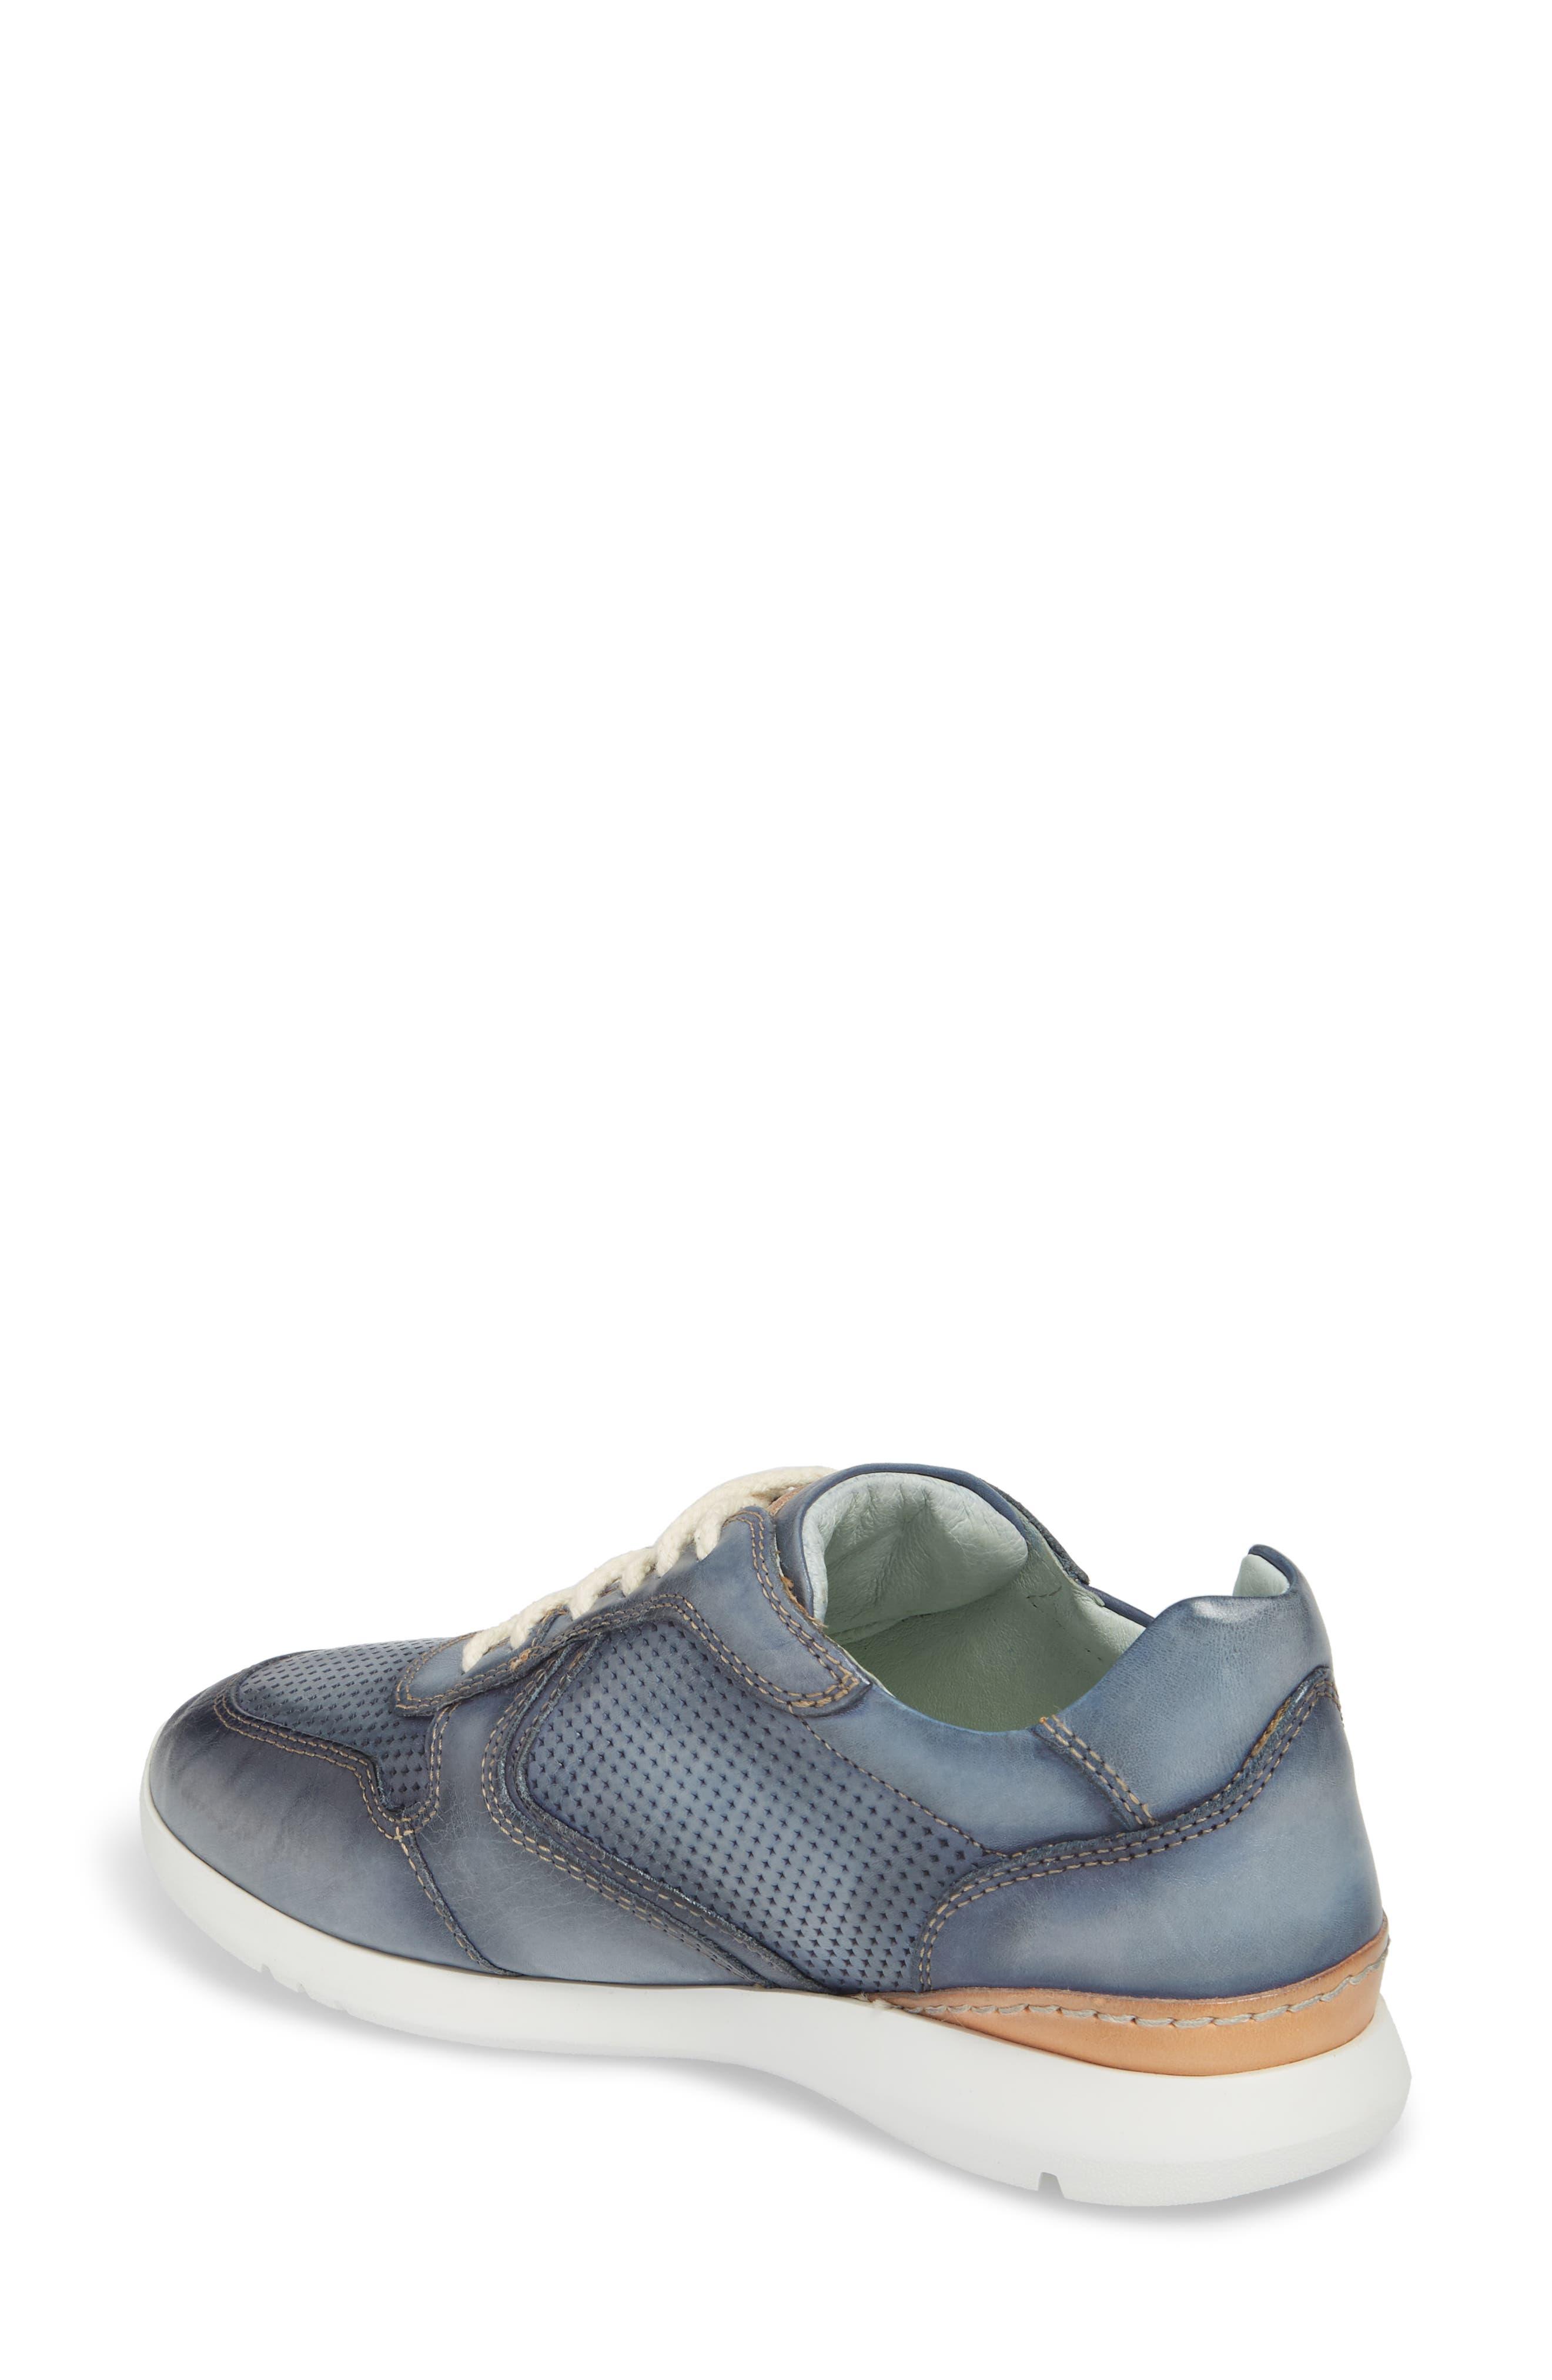 Modena Sneaker,                             Alternate thumbnail 2, color,                             400